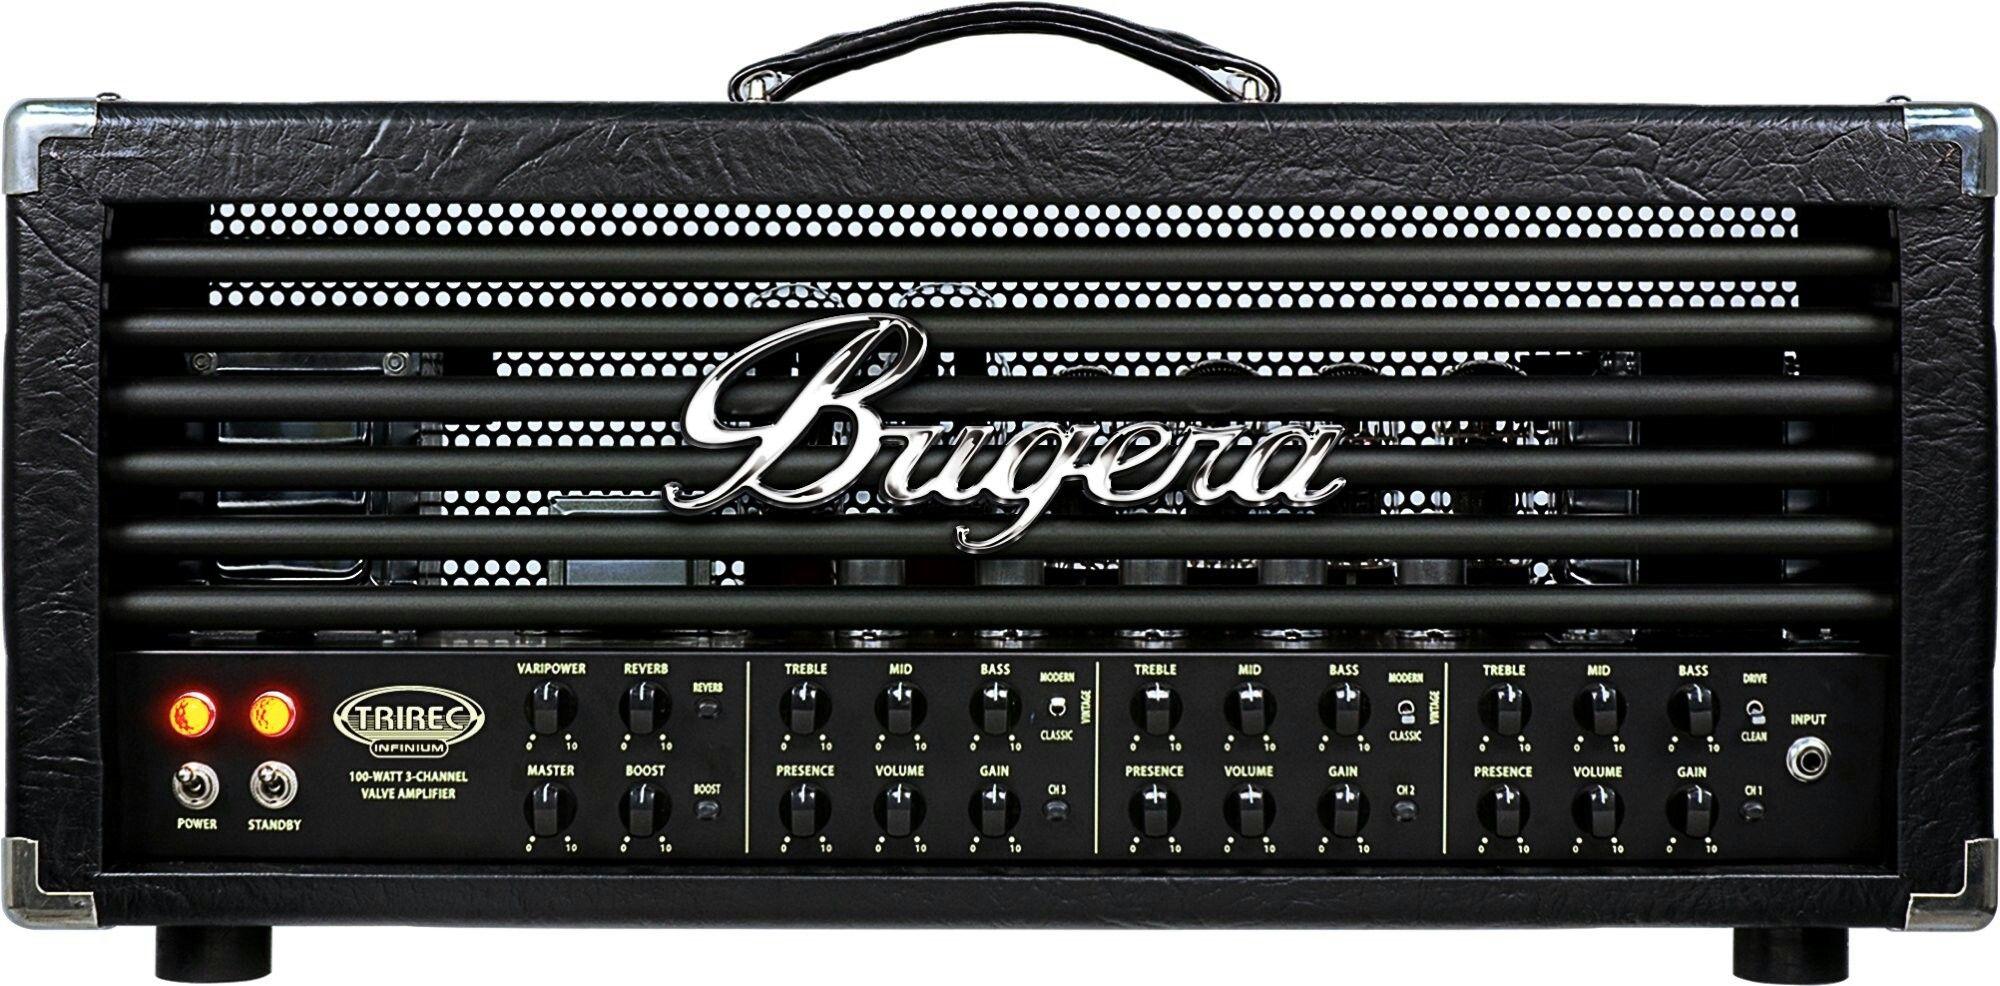 Bugera Trirec Infinium 100w Amp Head Amps Pinterest 100 W Valve Audio Amplifier